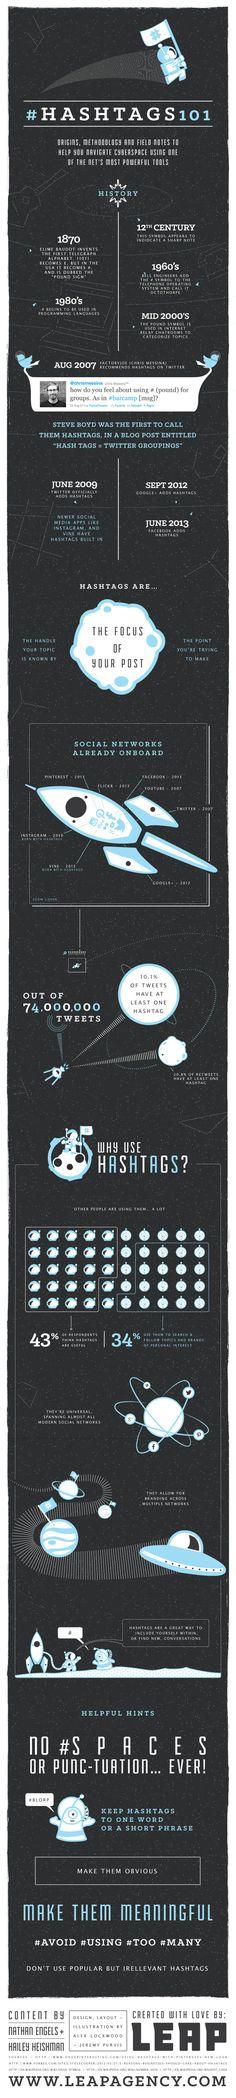 Historia del Hashtag #infographic #inforgrafía #socialmarketing